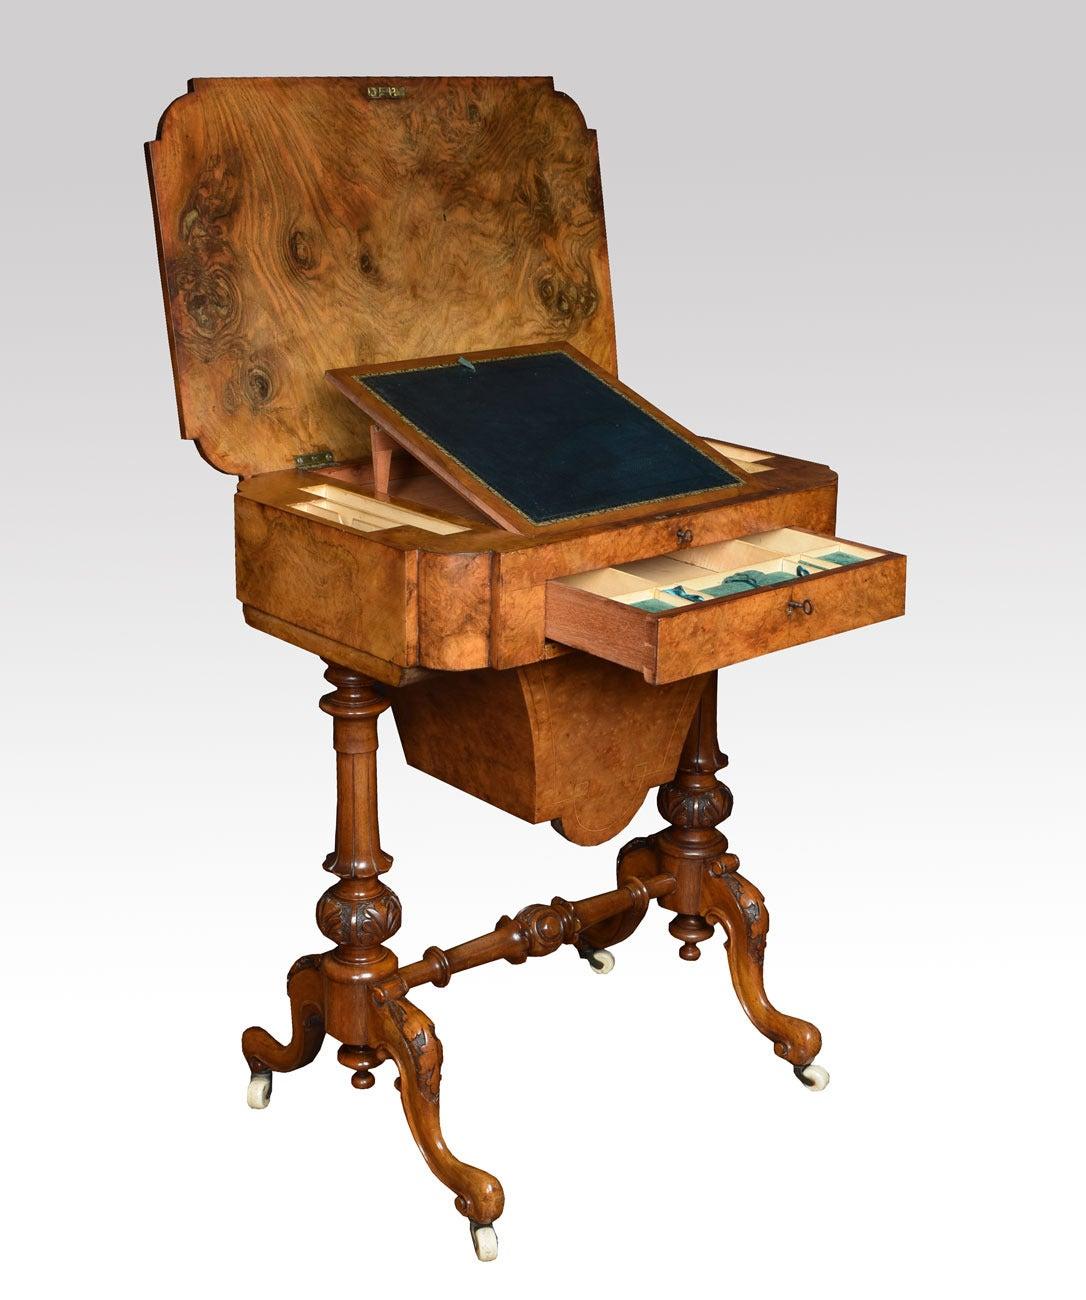 victorian walnut work table for sale at 1stdibs. Black Bedroom Furniture Sets. Home Design Ideas